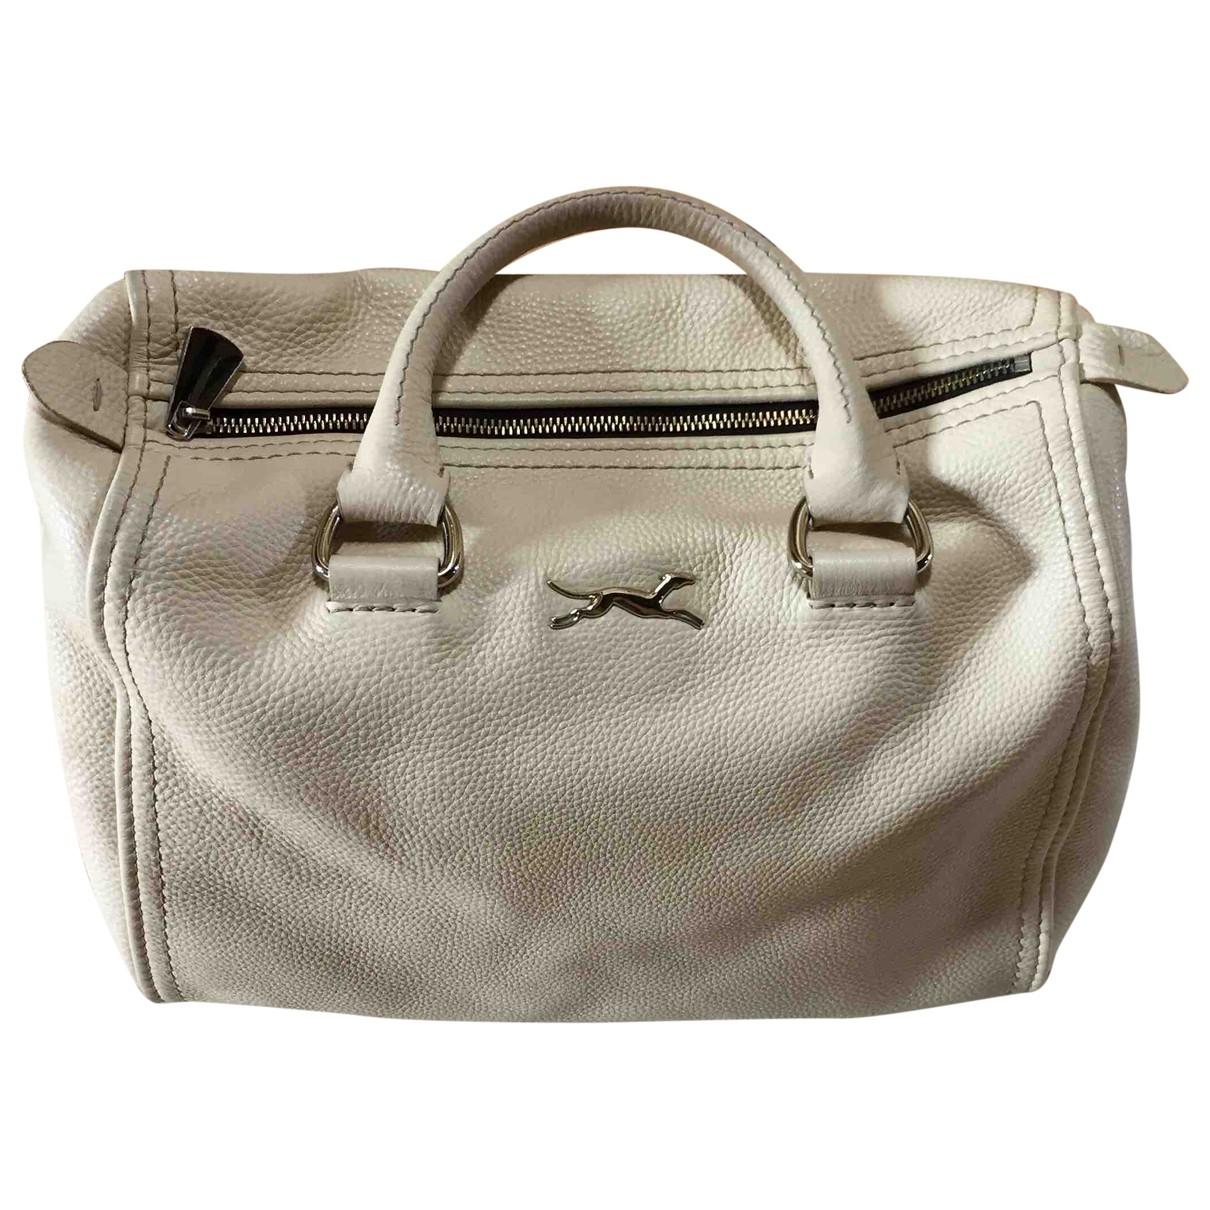 Bimba Y Lola \N Ecru Leather handbag for Women \N